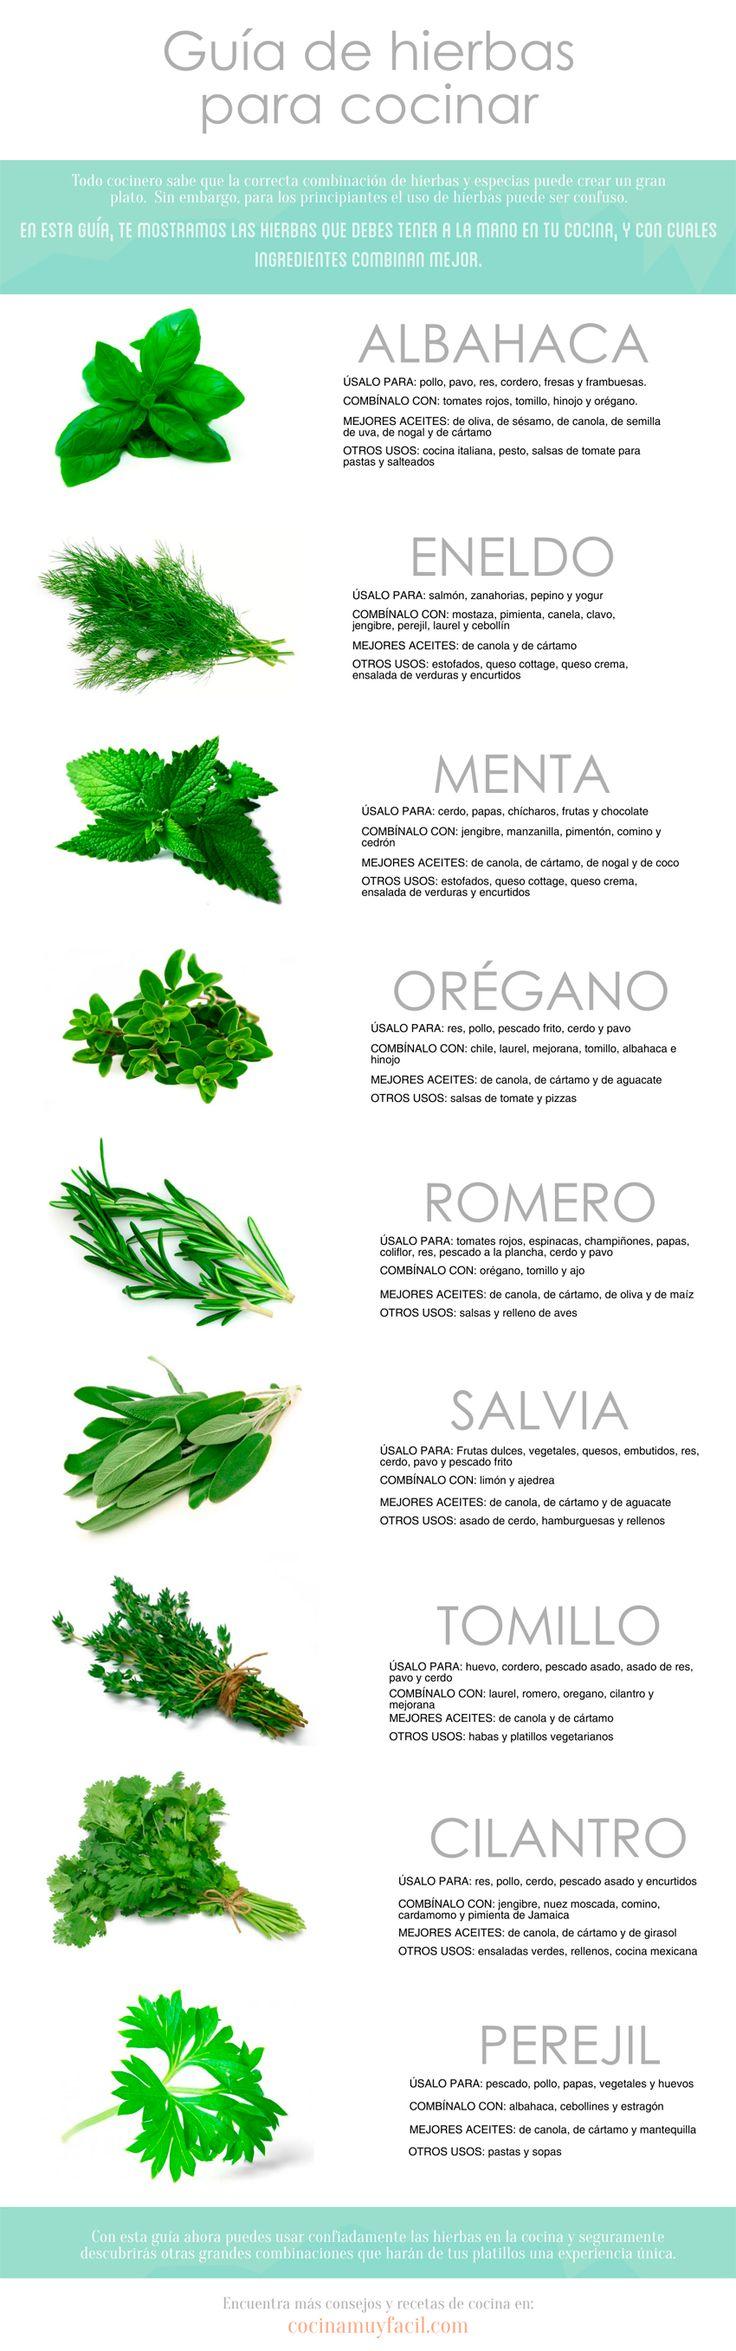 guia-hierbas-aromaticas-cocinar